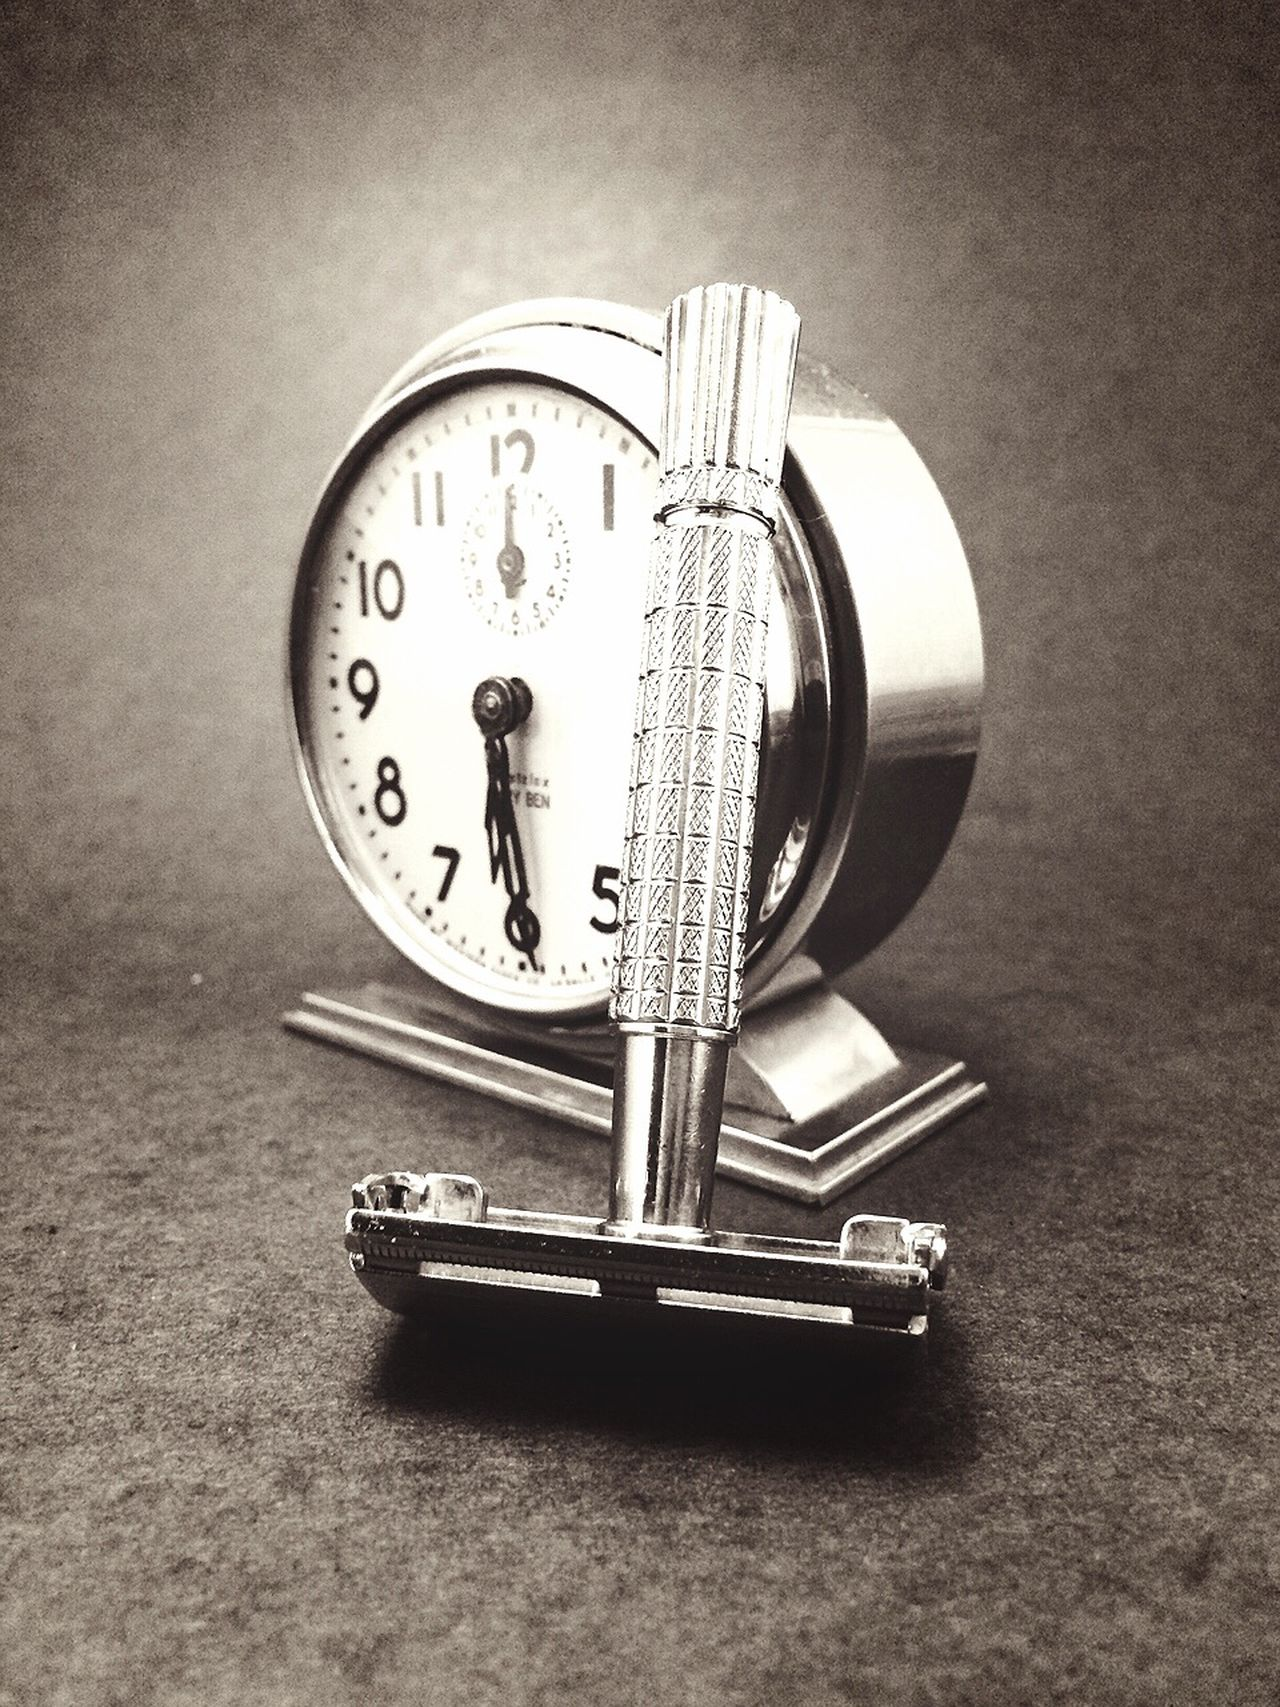 Clock Etsy Razor Vintage Black And White RRelix